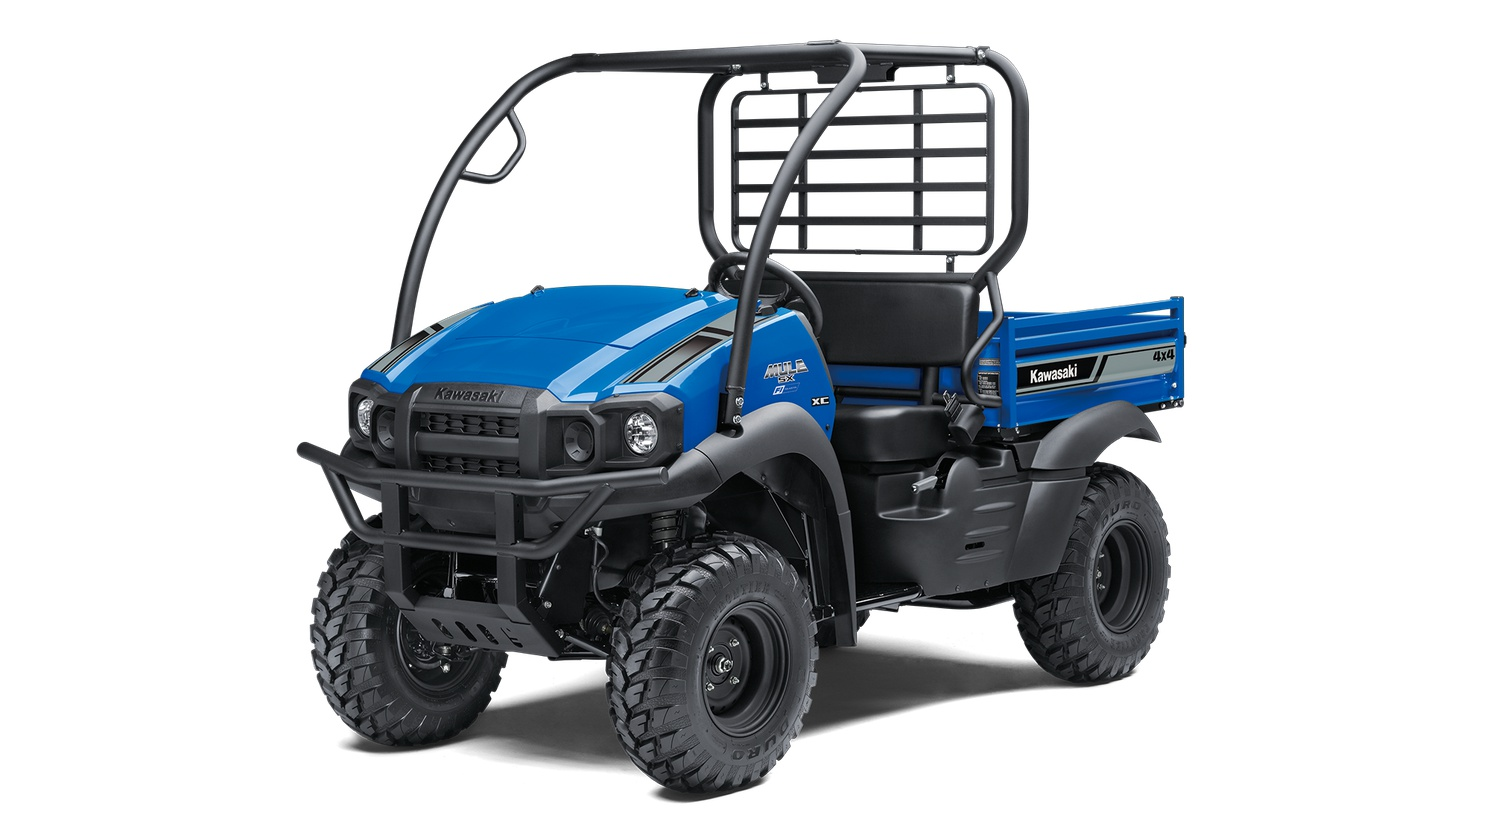 2021 Kawasaki MULE SX 4x4 XC FI Vibrant Blue